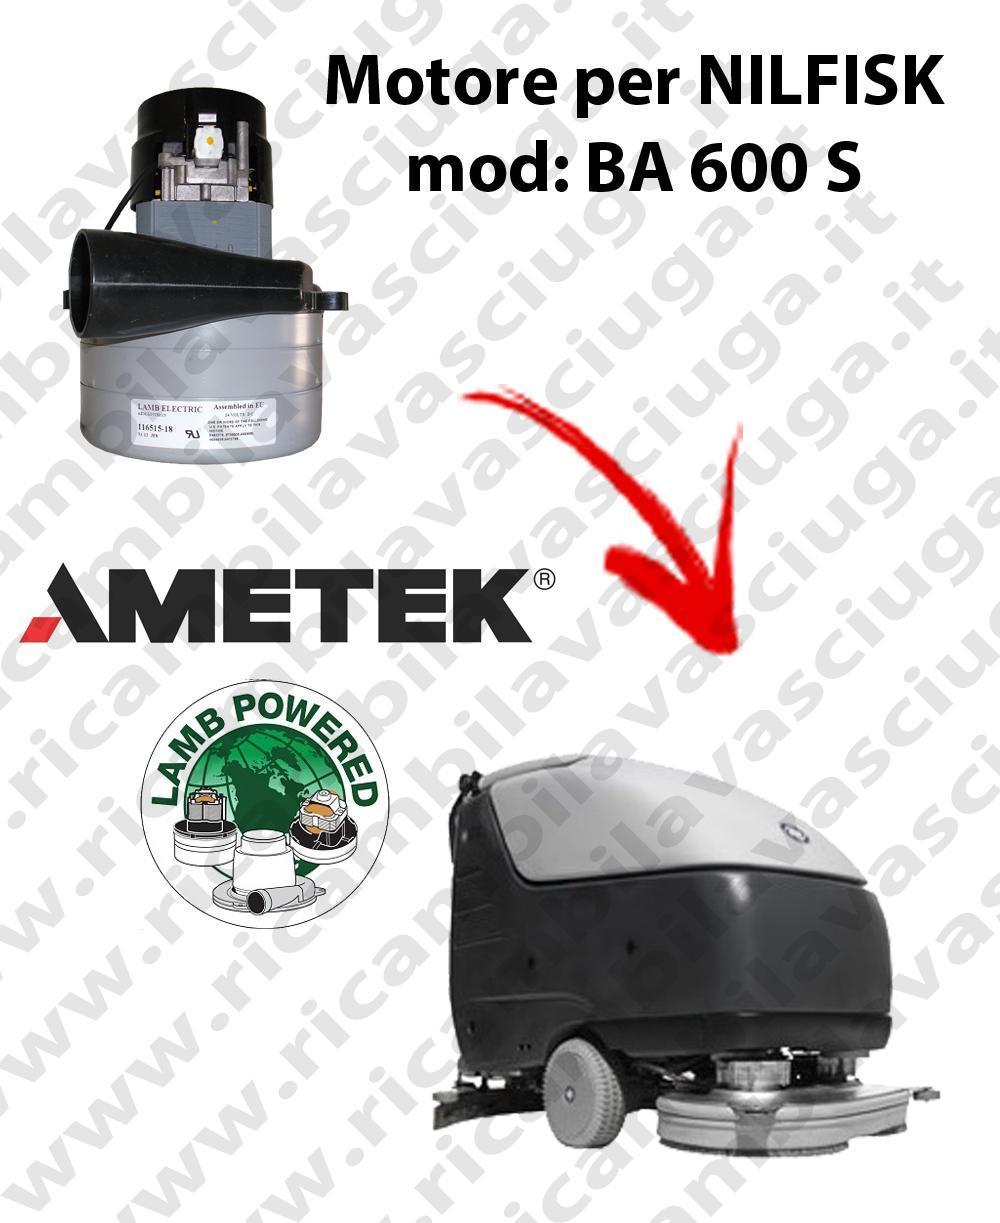 BA 600 S Vacuum motor LAMB AMETEK for scrubber dryer NILFISK